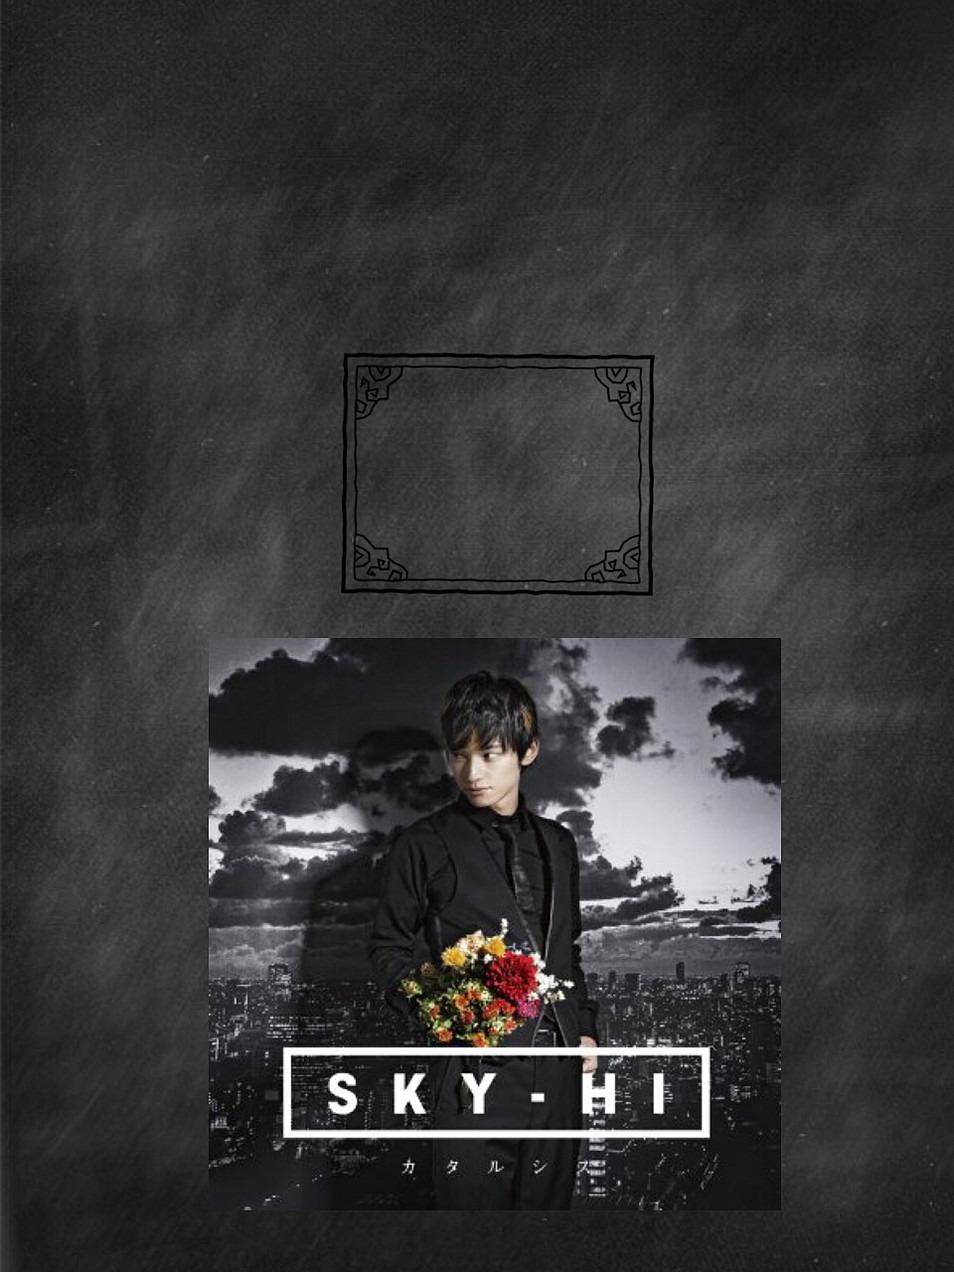 Sky Hi Iphone ロック画面 完全無料画像検索のプリ画像 Bygmo